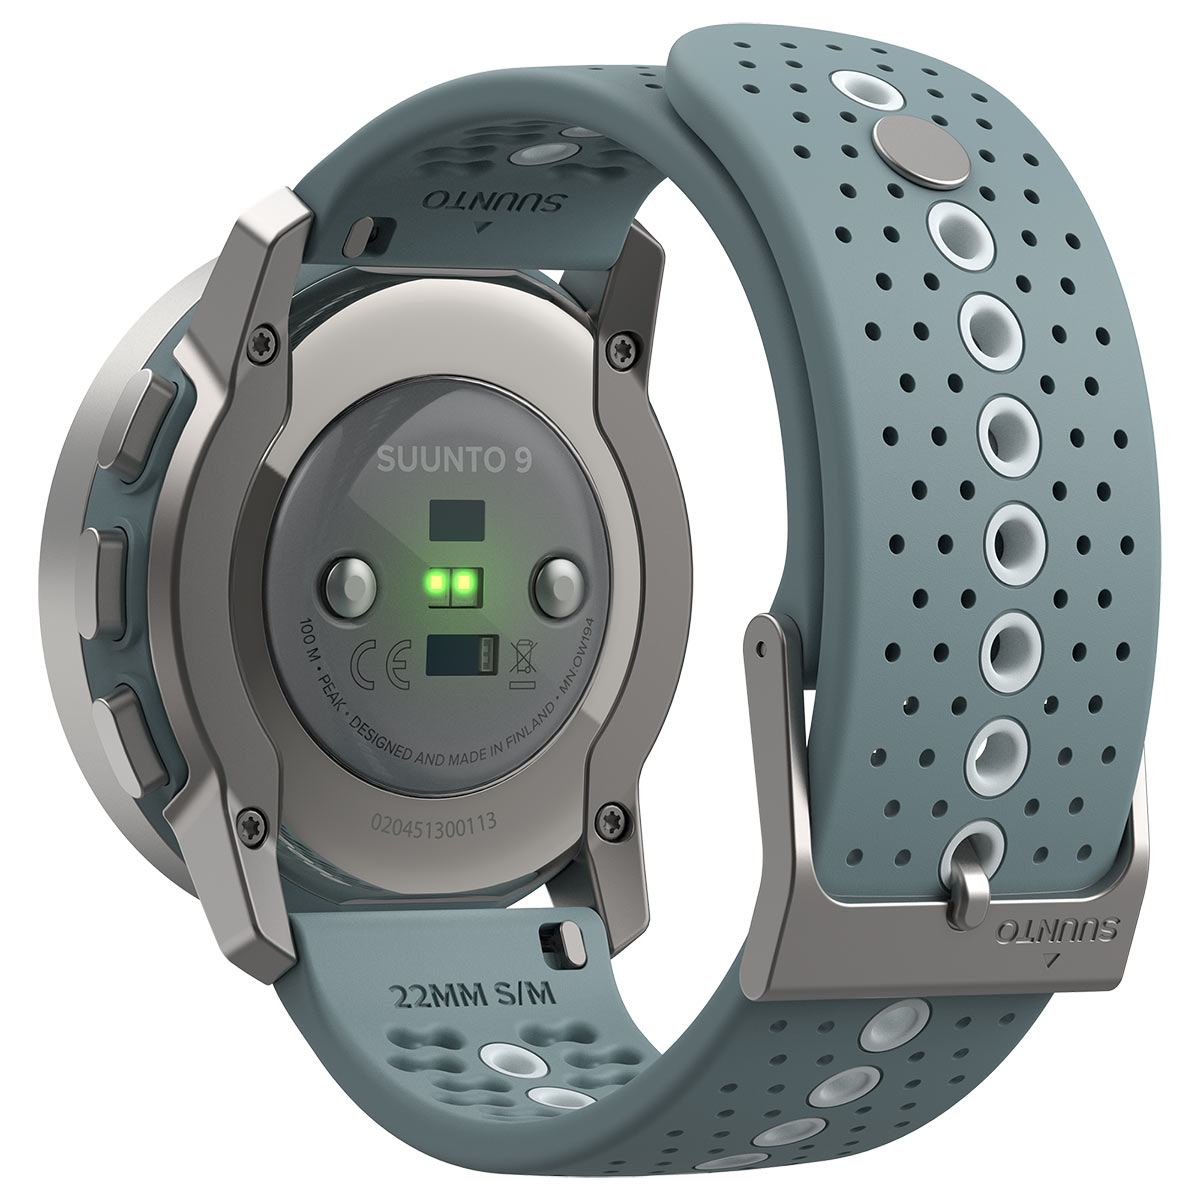 new suunto 9 peak gps multisport watch has built in heart rate and blood oxygen sensors